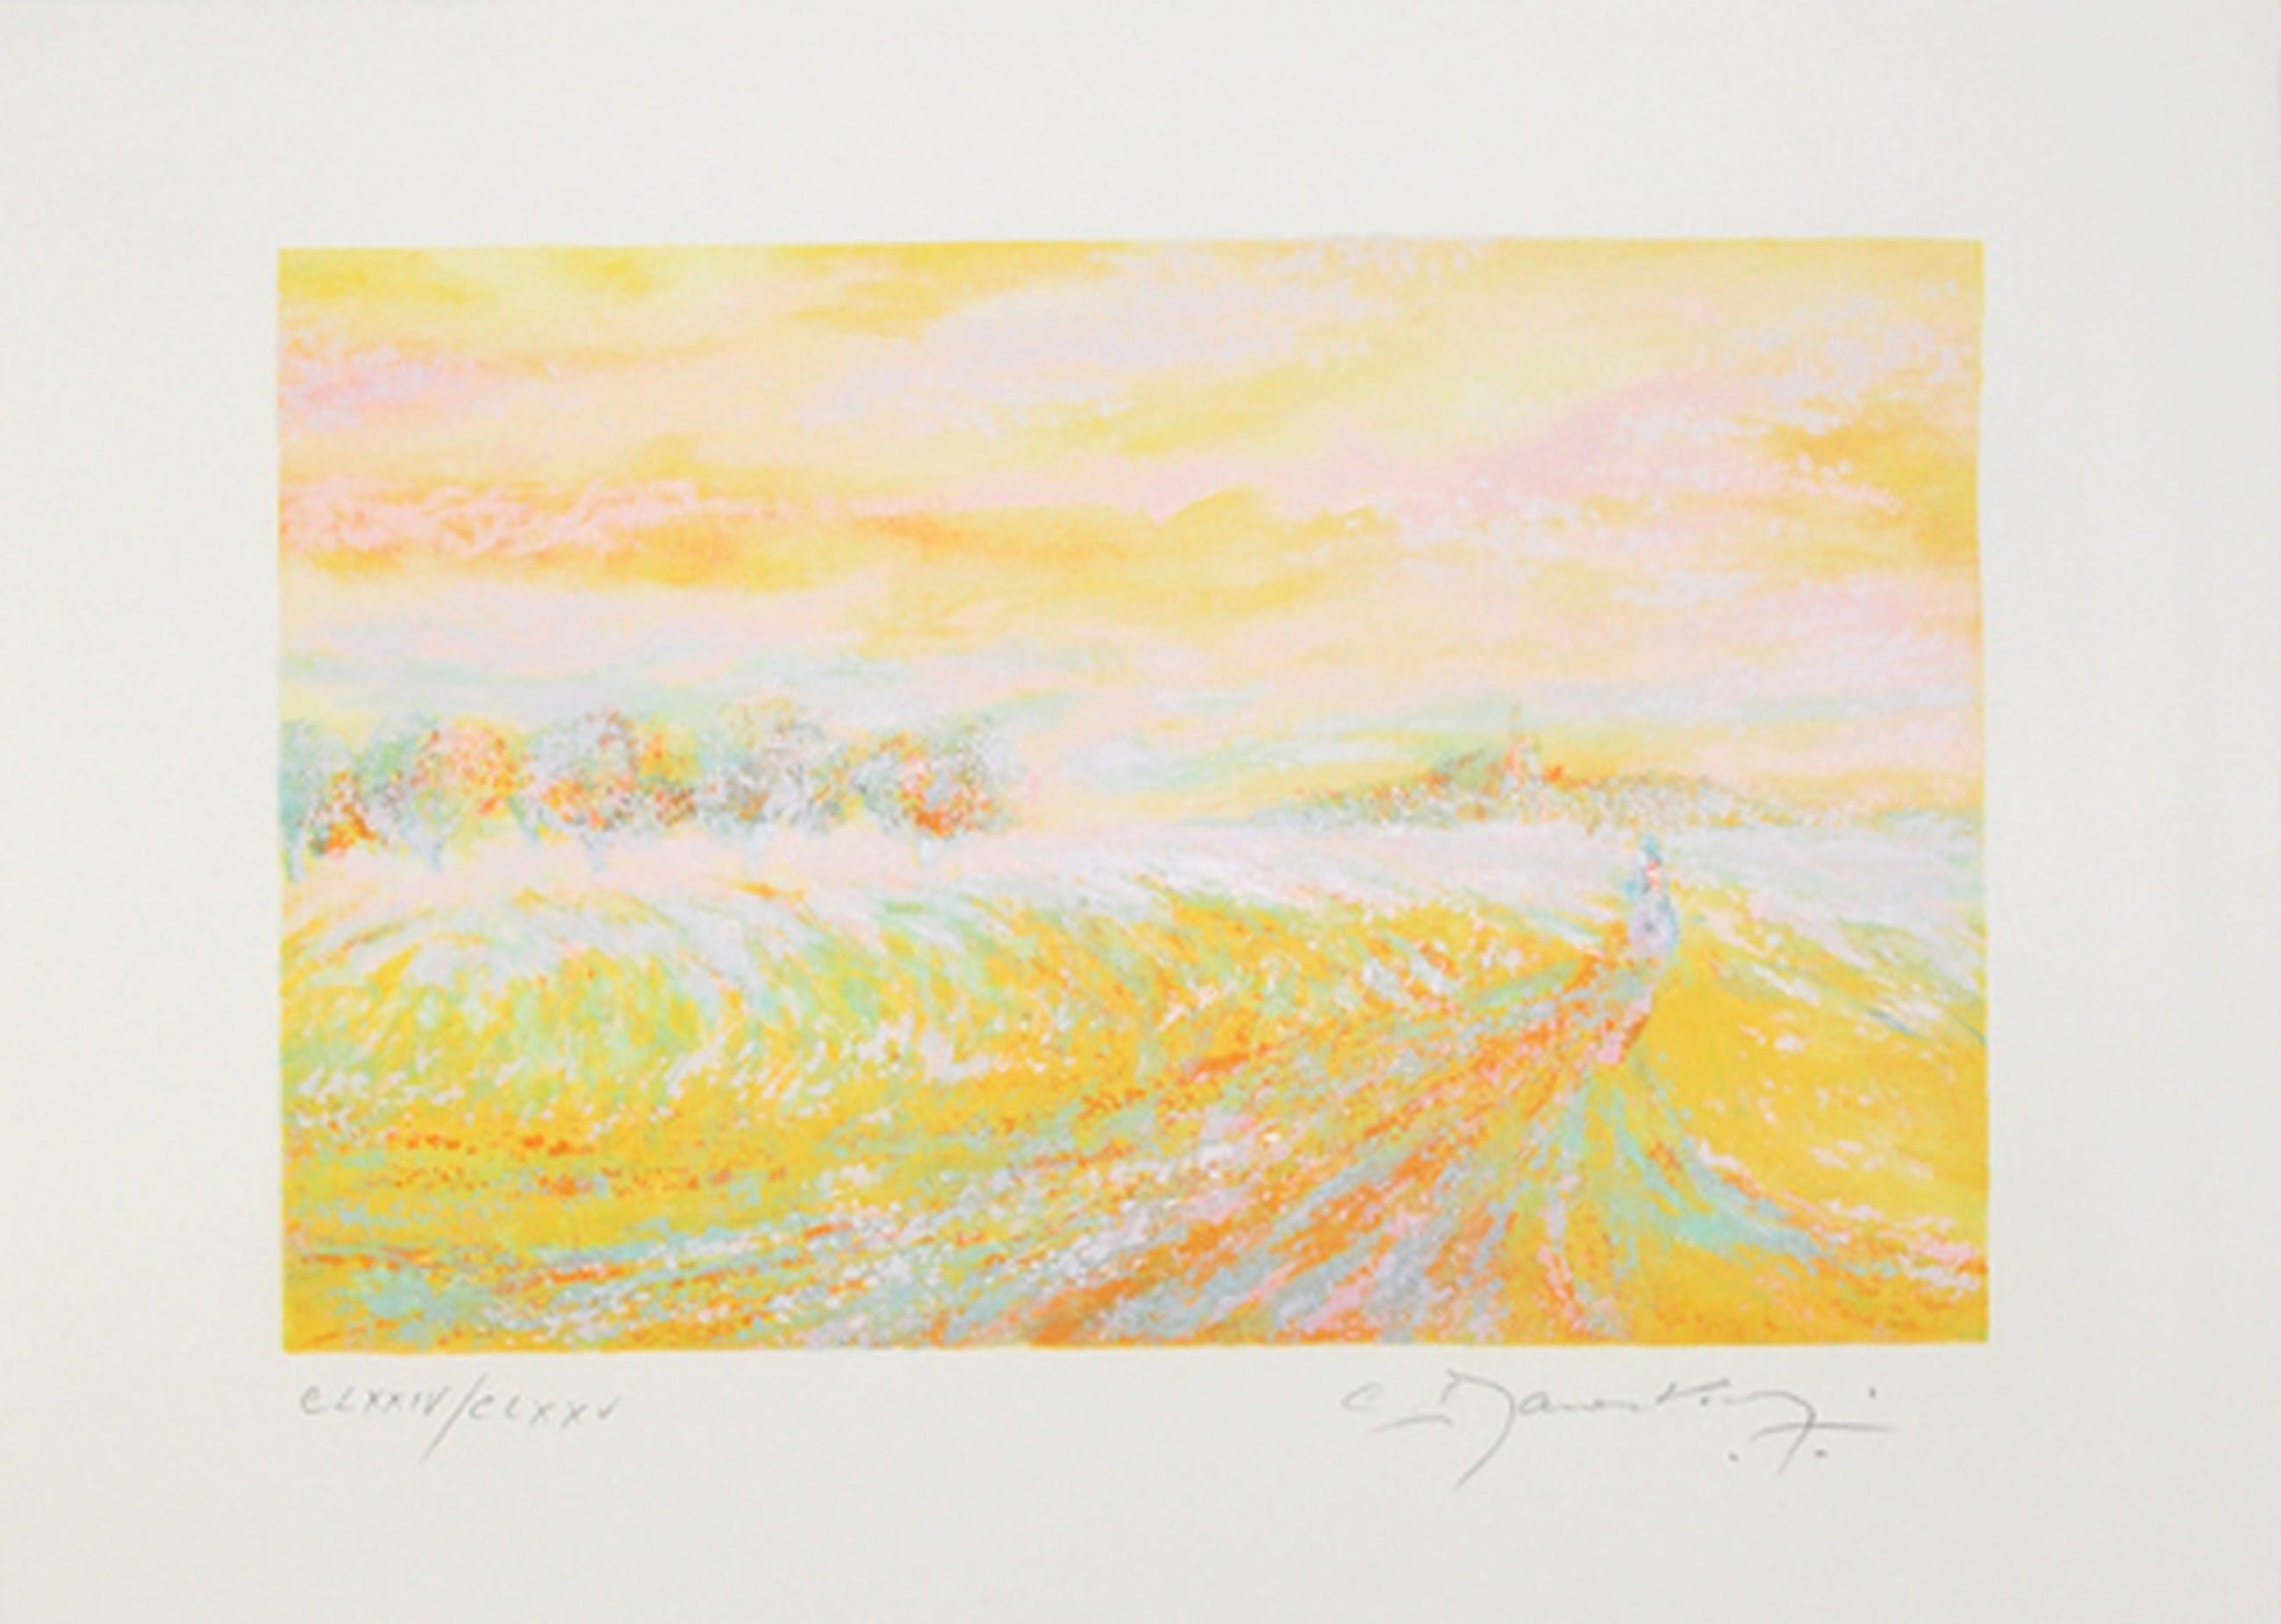 Claude Manoukian - Impression jaume -kleurlitho op Bütten handgesigneerd kopen? Bied vanaf 1!